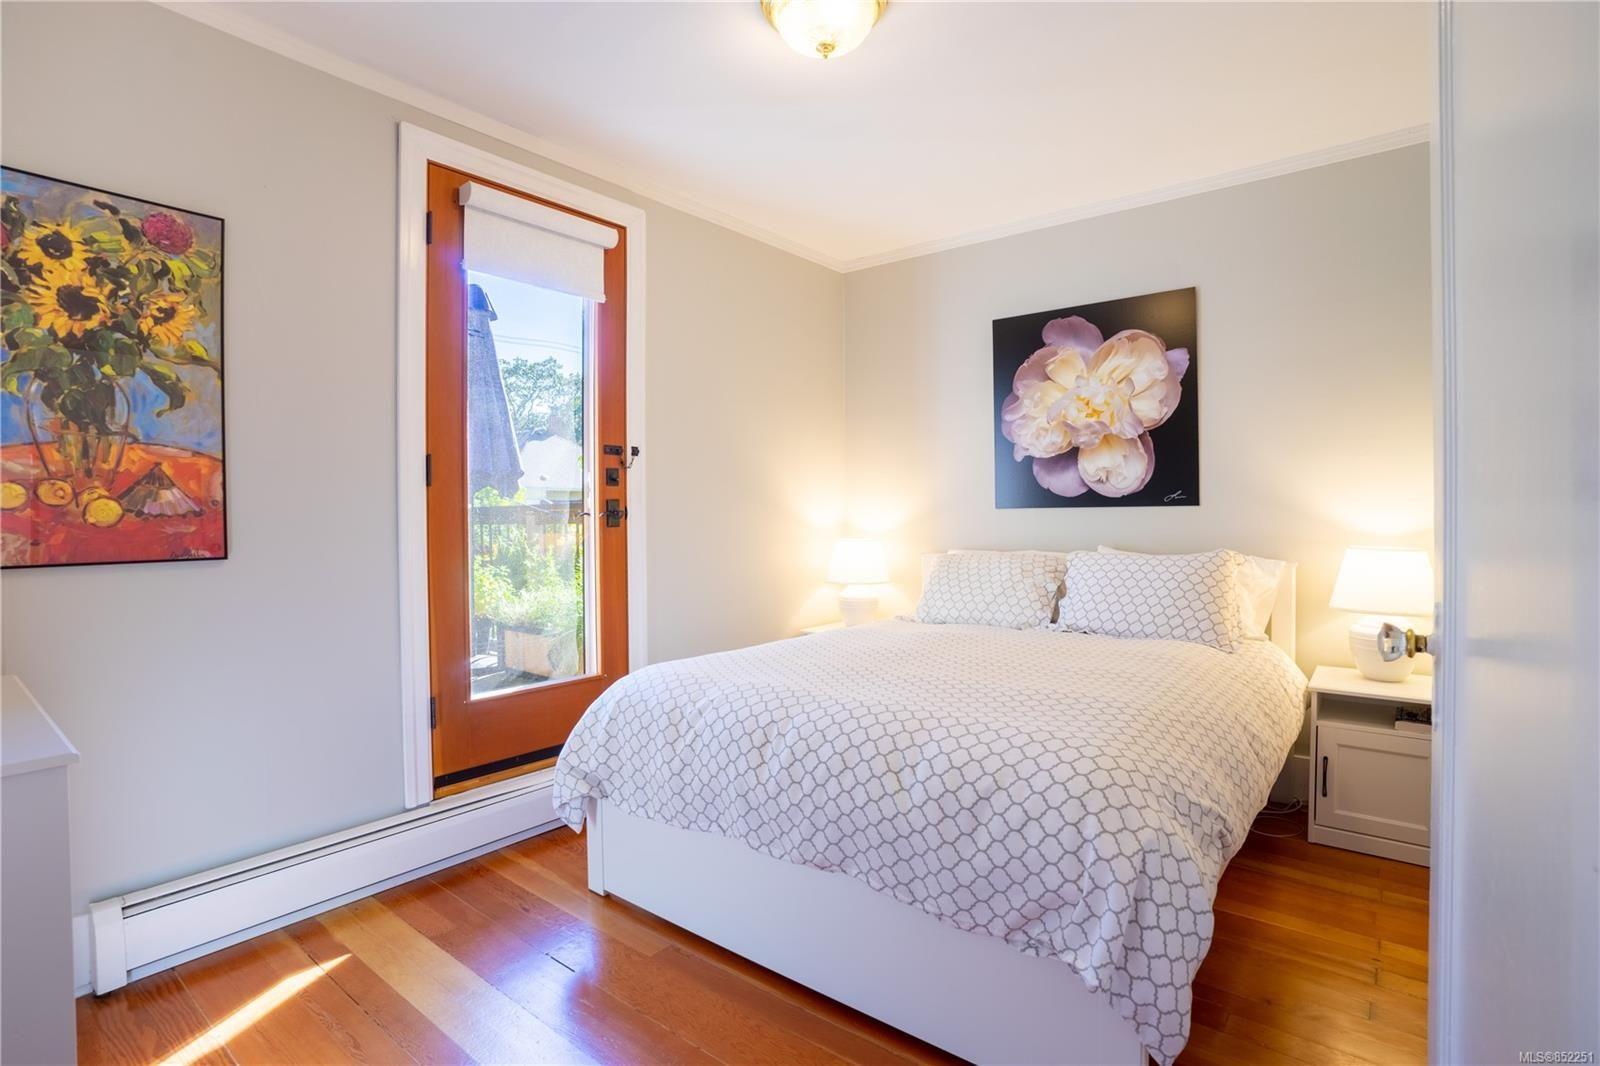 Photo 16: Photos: 2363 Pacific Ave in : OB Estevan House for sale (Oak Bay)  : MLS®# 852251